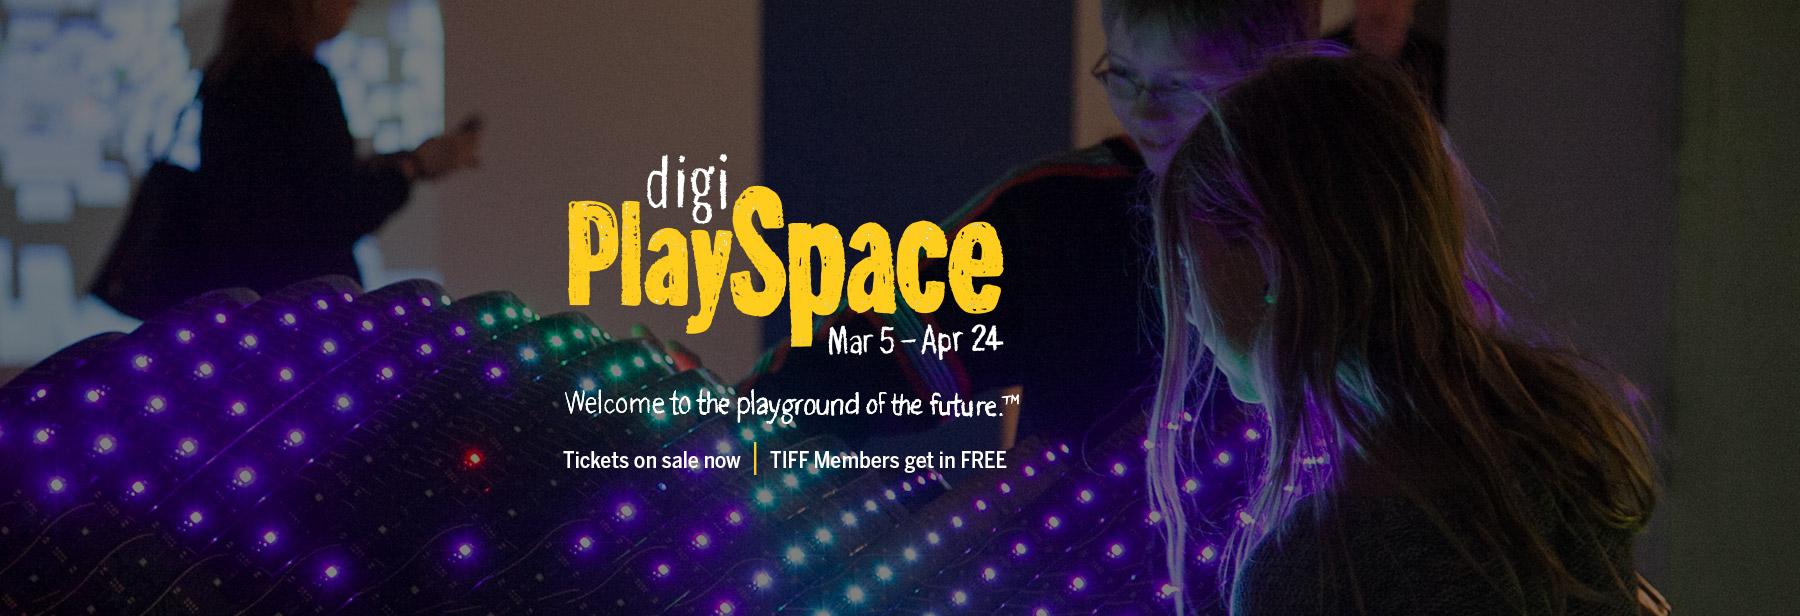 digiPlaySpace